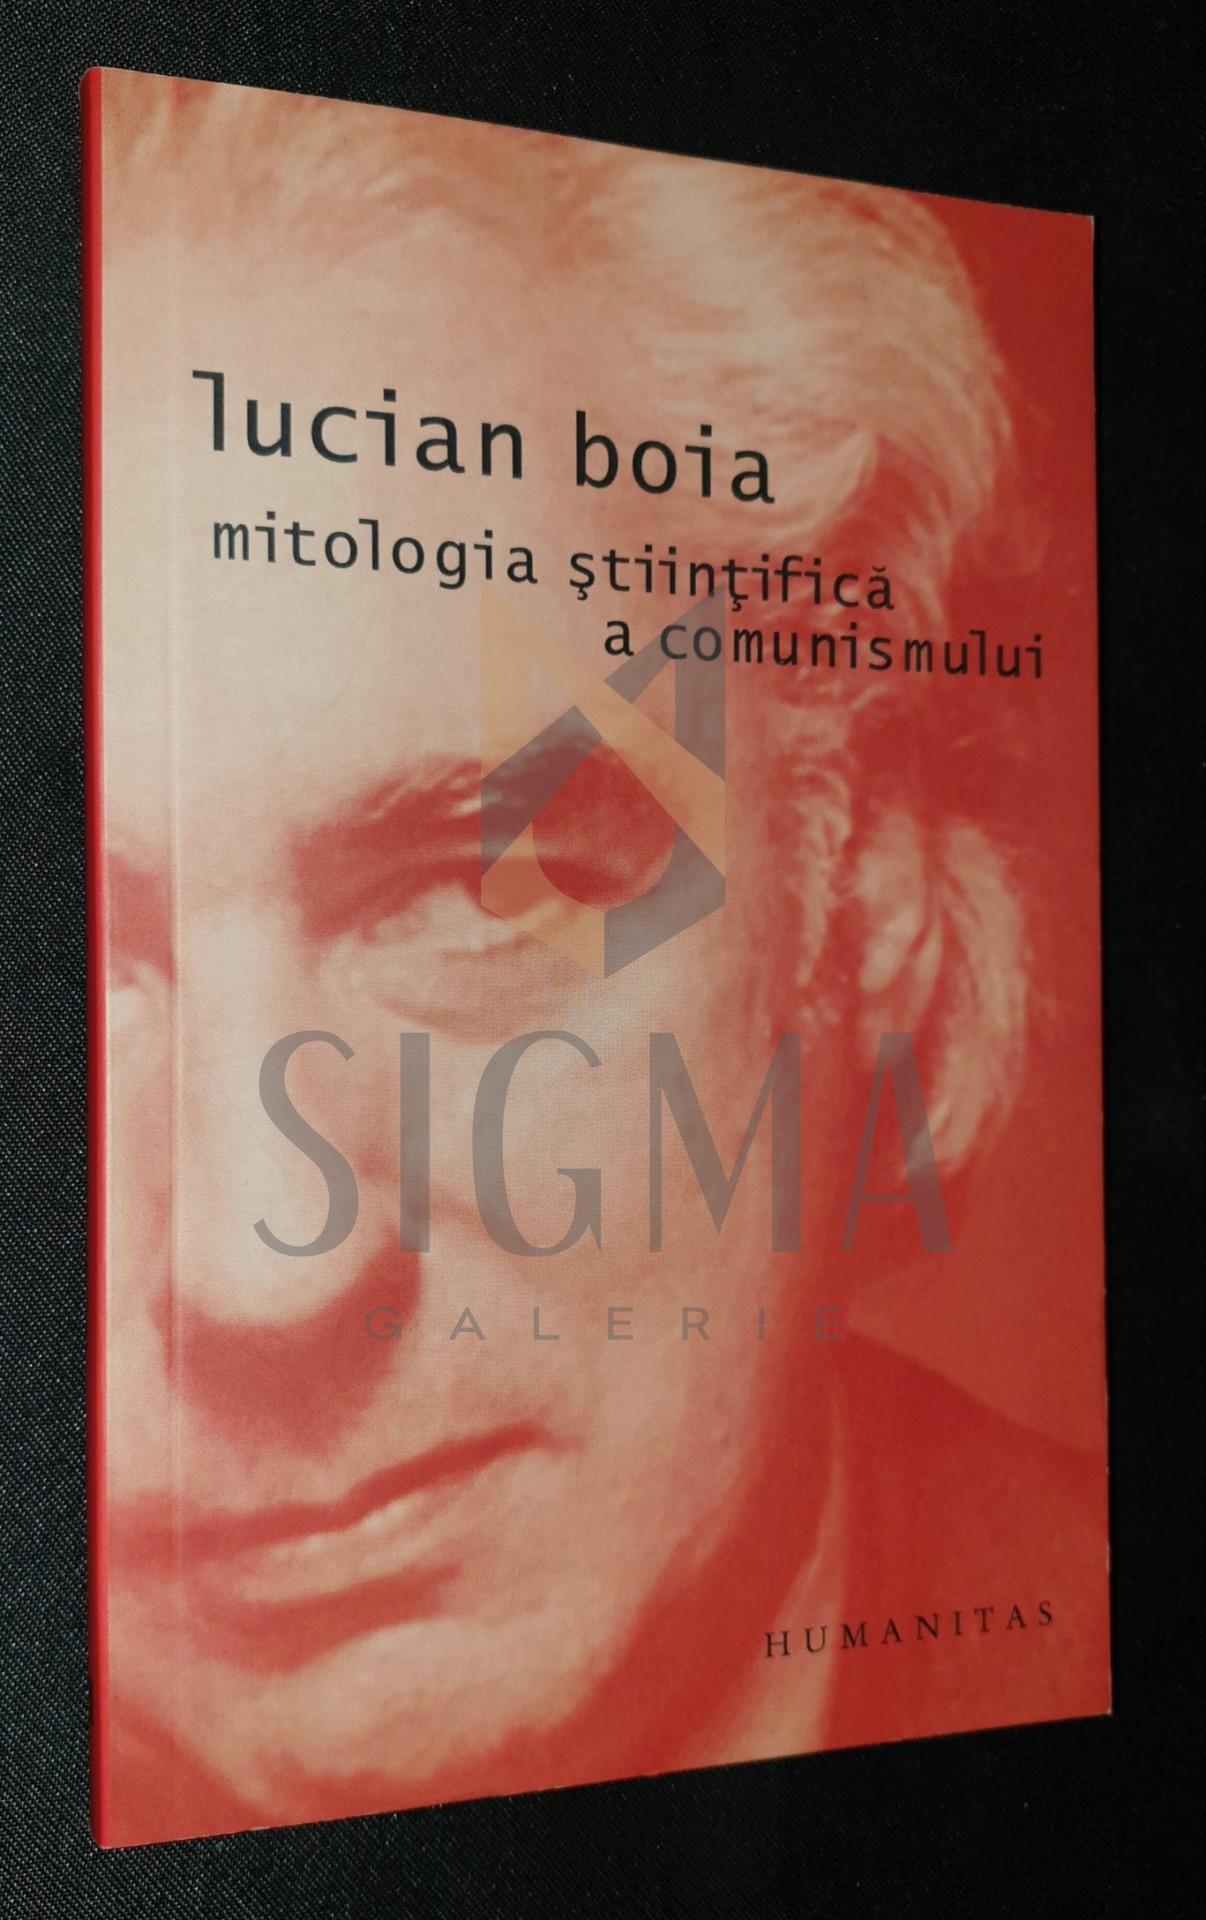 LUCIAN BOIA